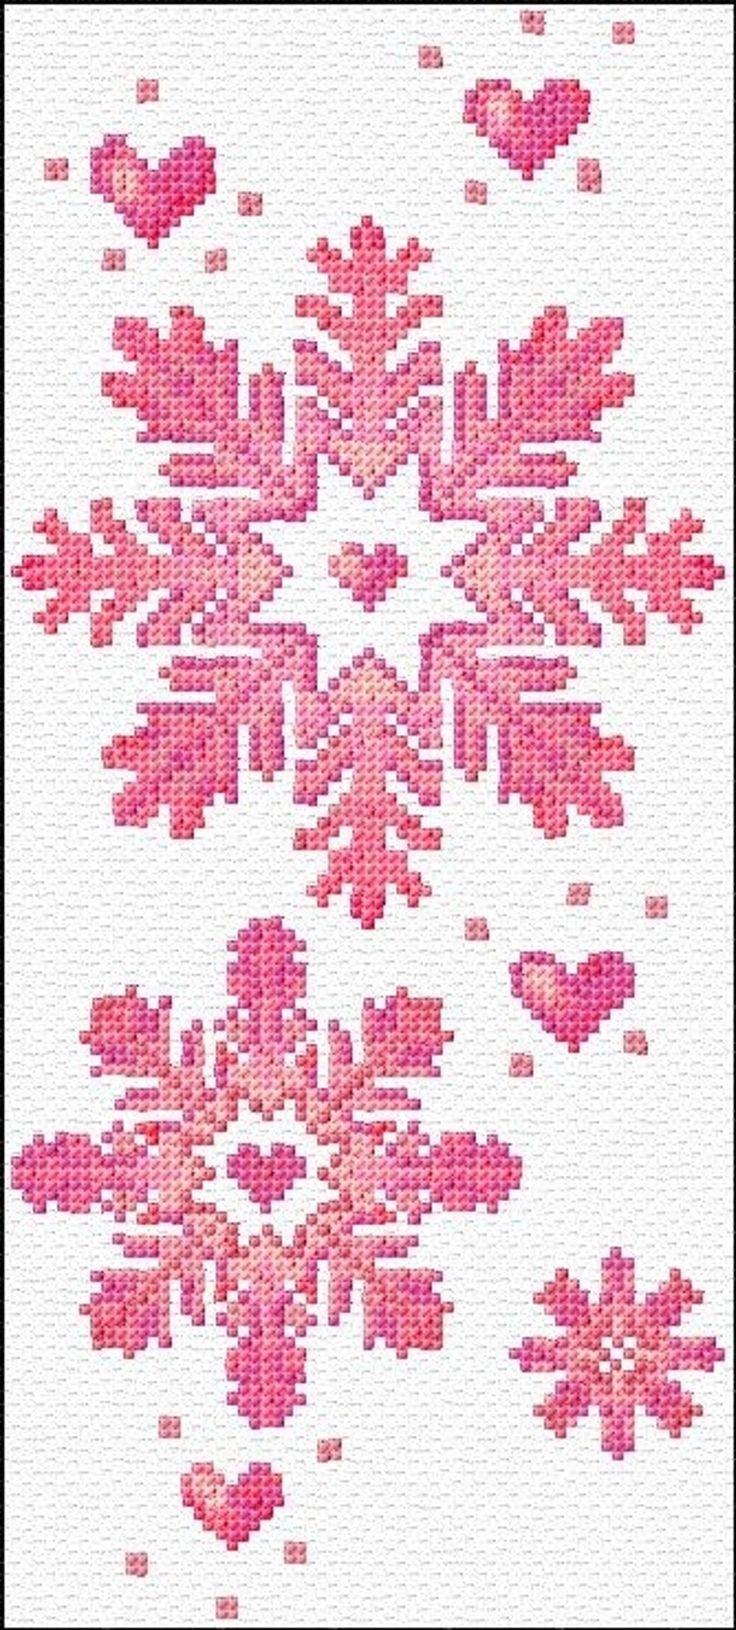 Best cross stitch images on pinterest punto croce